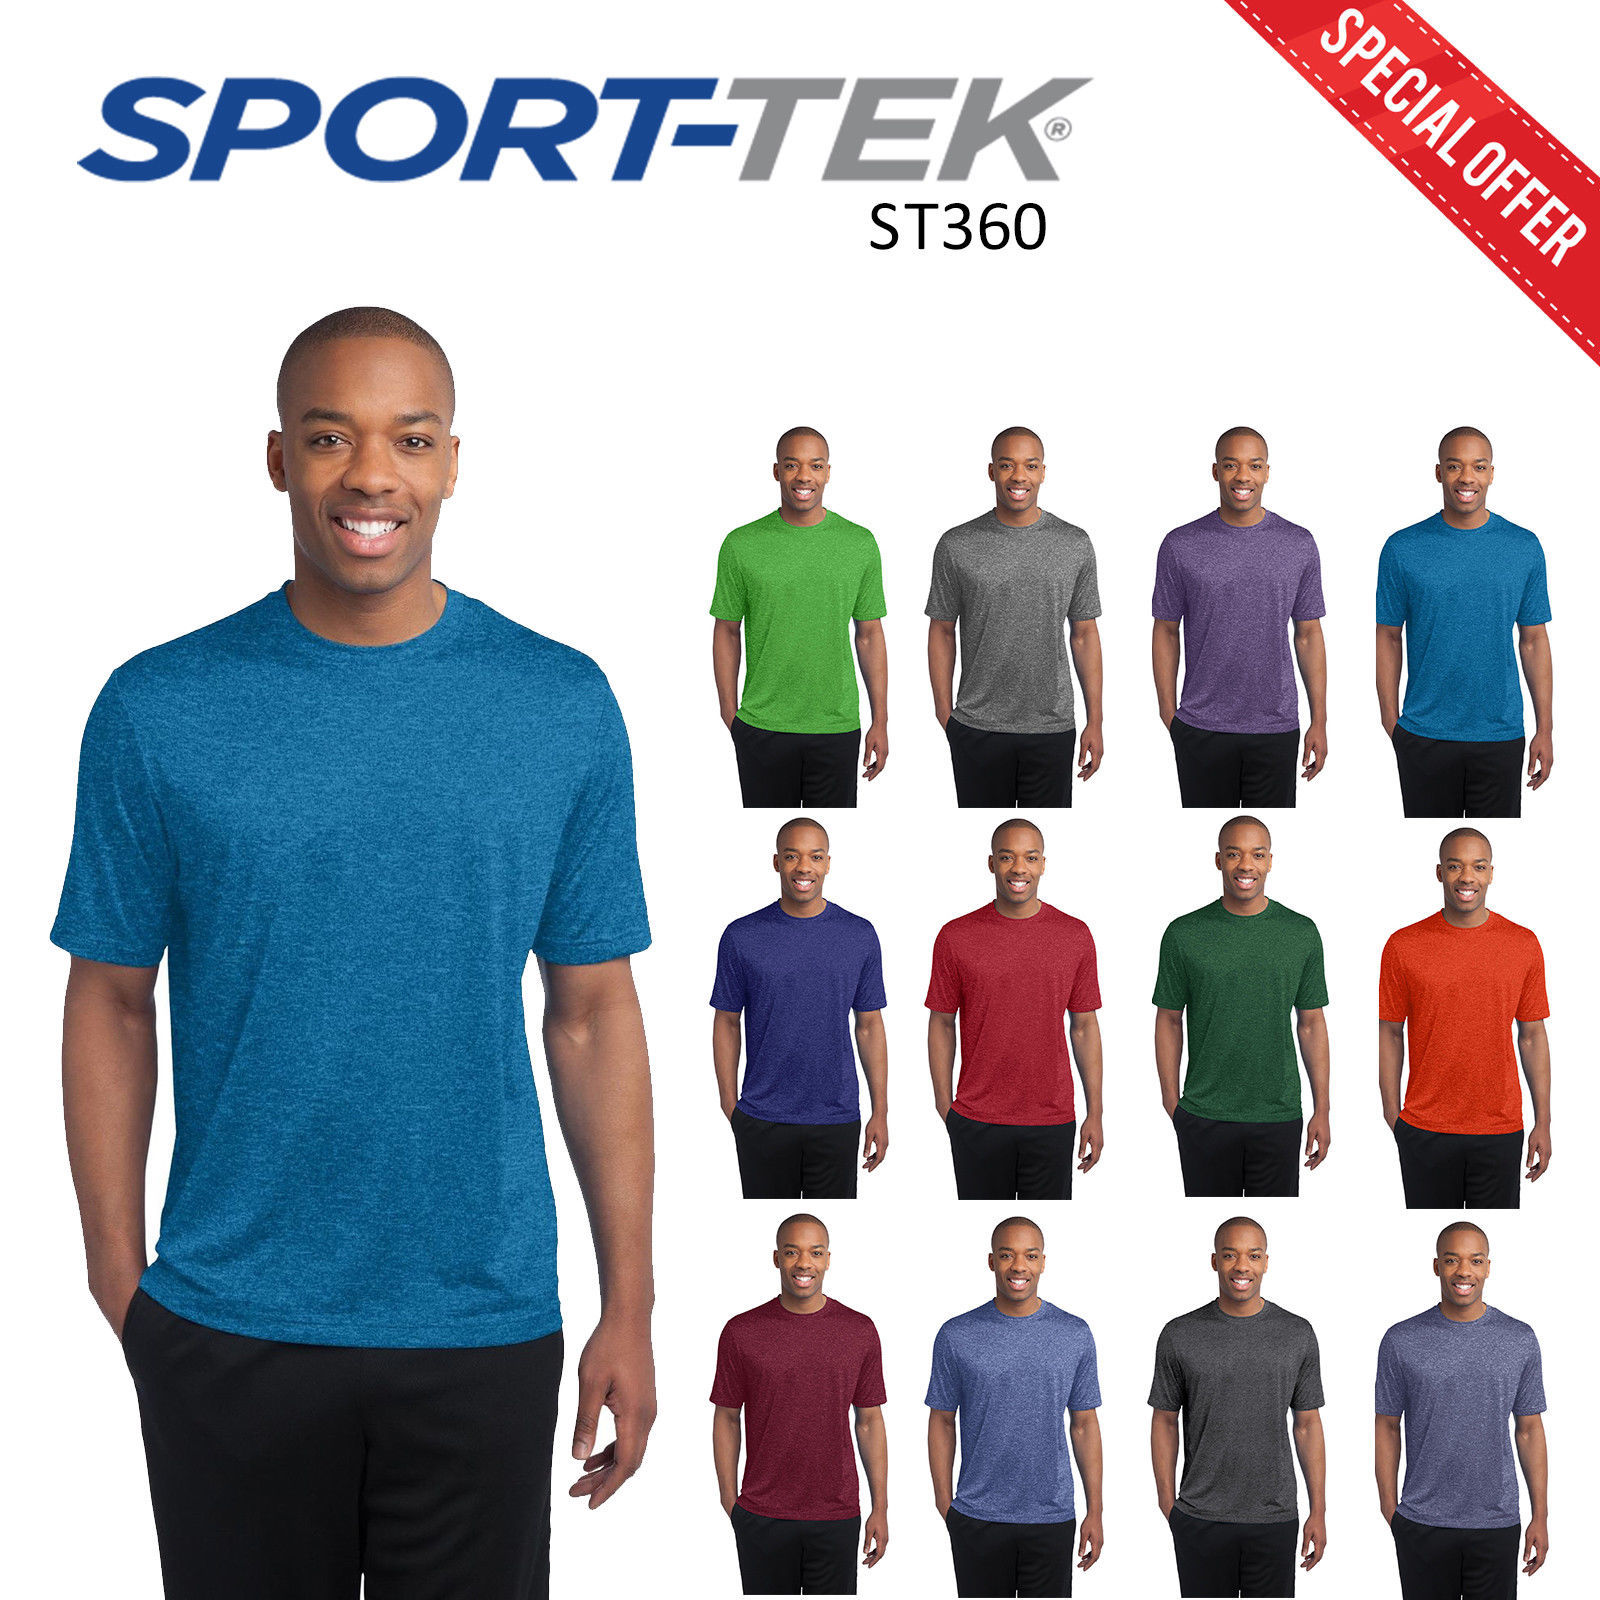 d8f27b75a Sport Tek Performance Heather Contender Mens Short Sleeve Casual Wear  Tshirt -  7.90 -  14.24